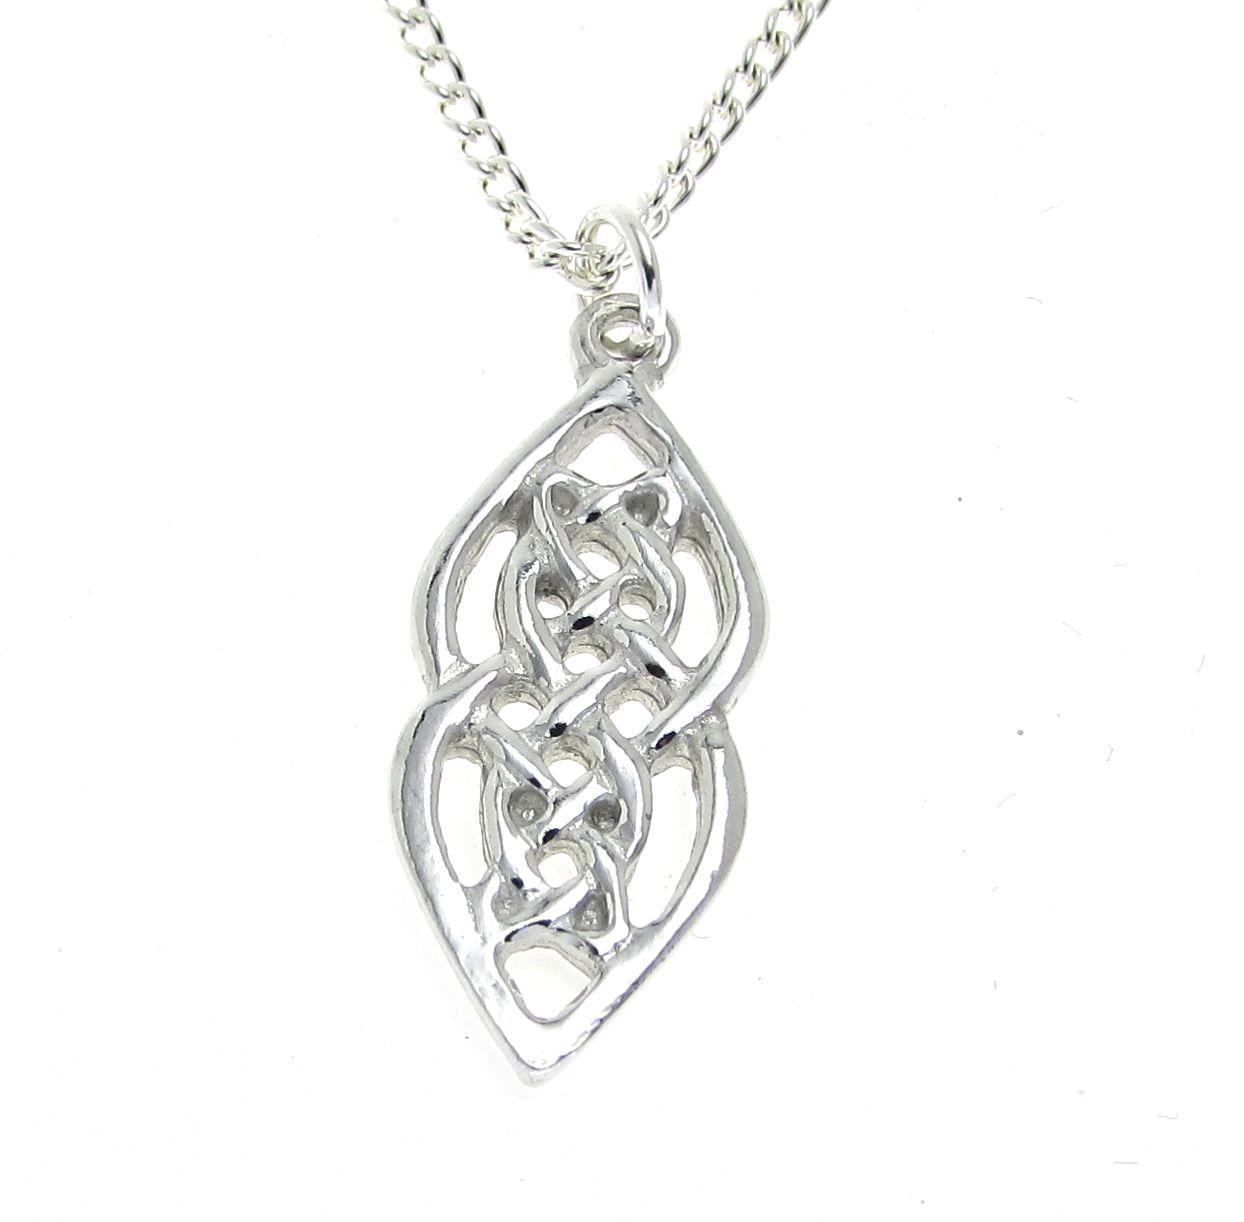 Celtic knot pendant cast in Cornish tin